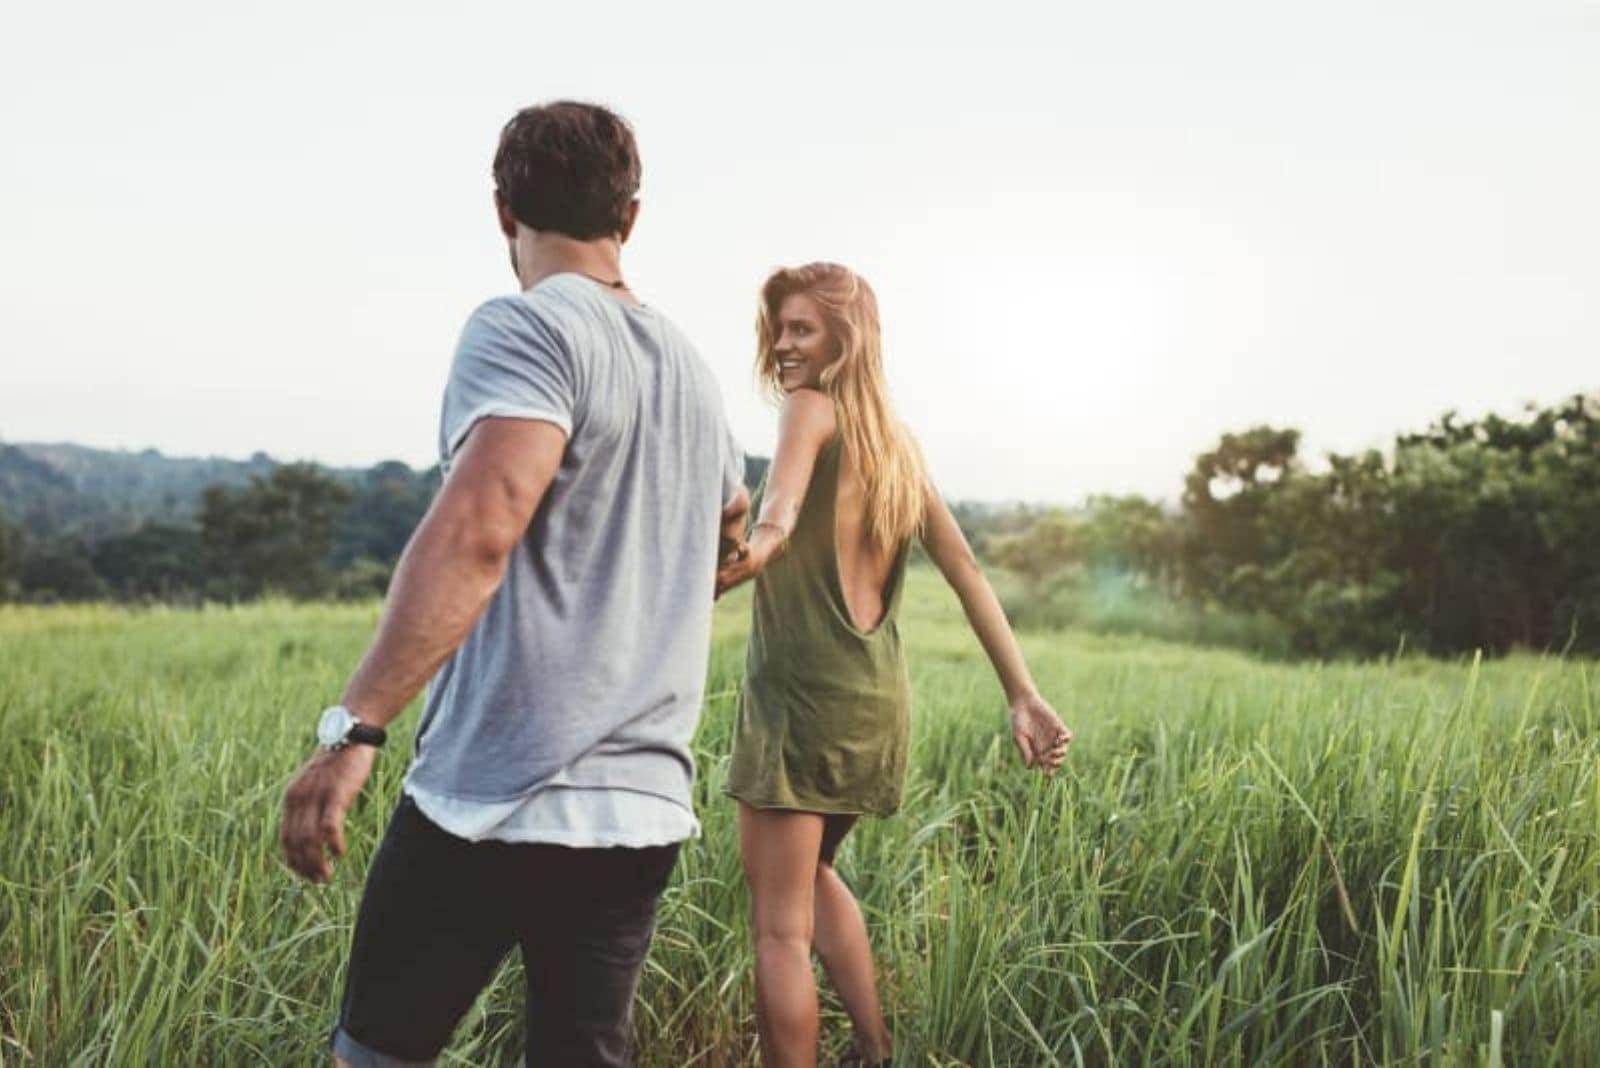 girl in green dress with her boyfriend having fun